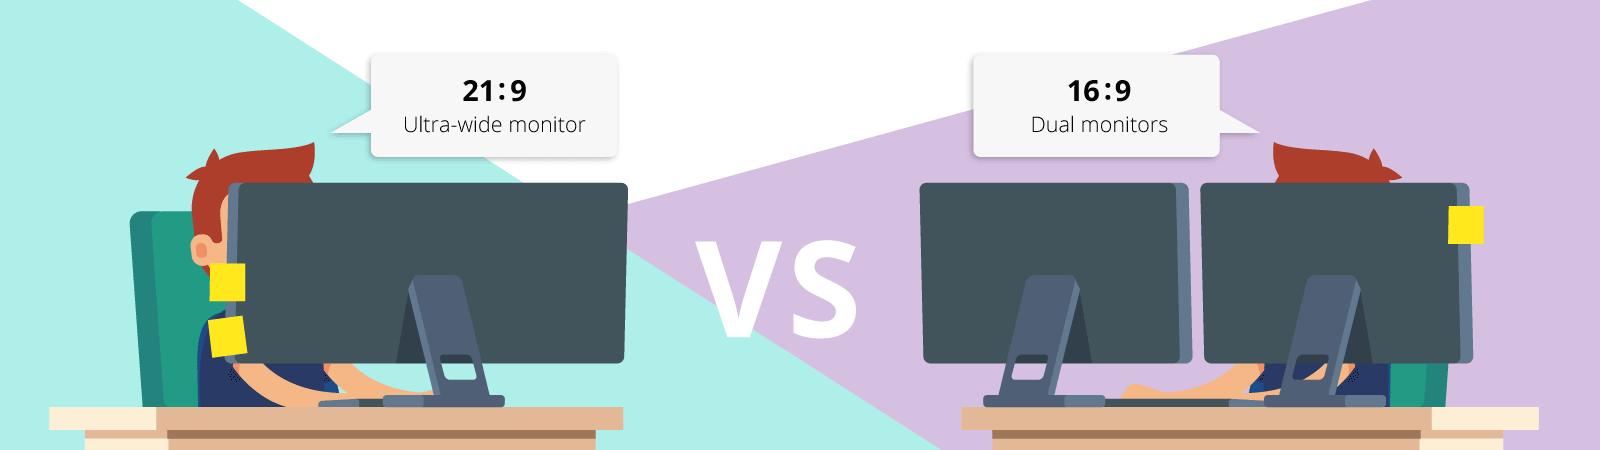 UltraWide vs Dual Monitor